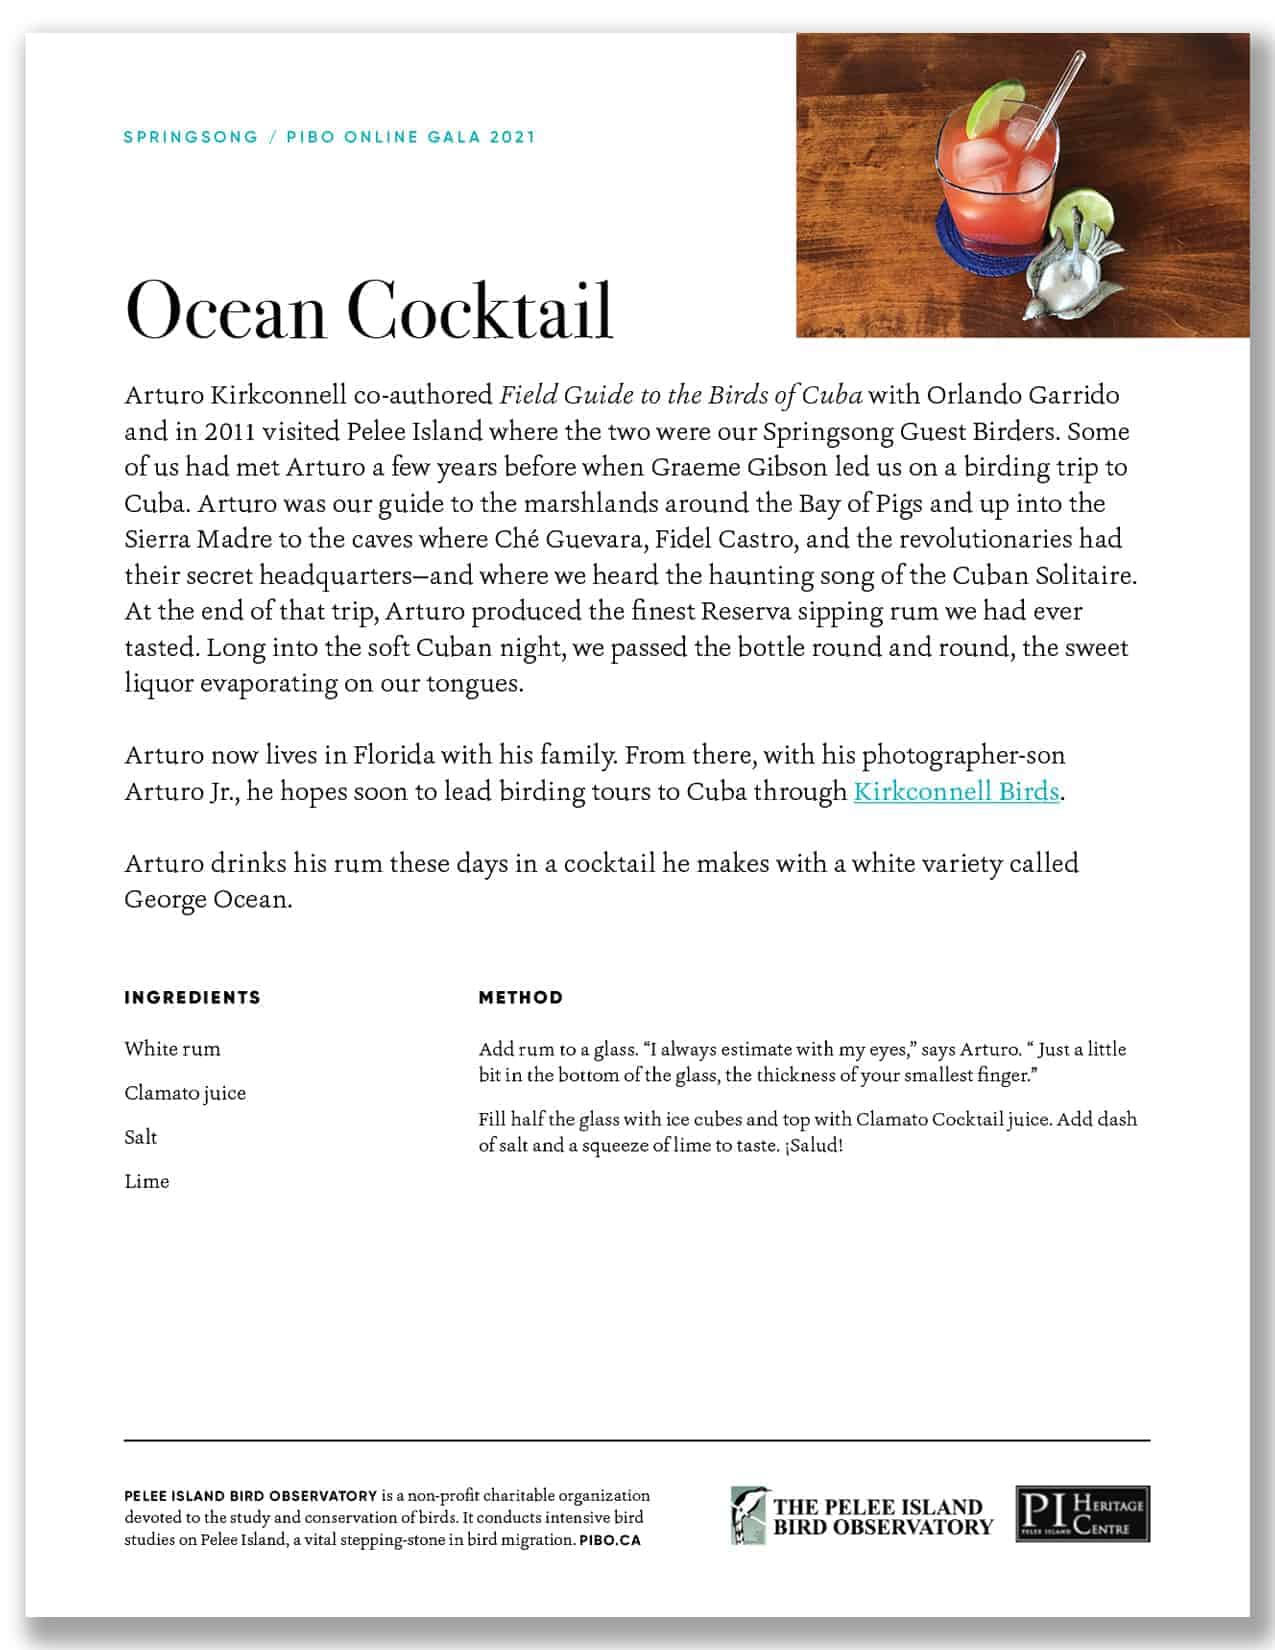 Ocean Cocktail